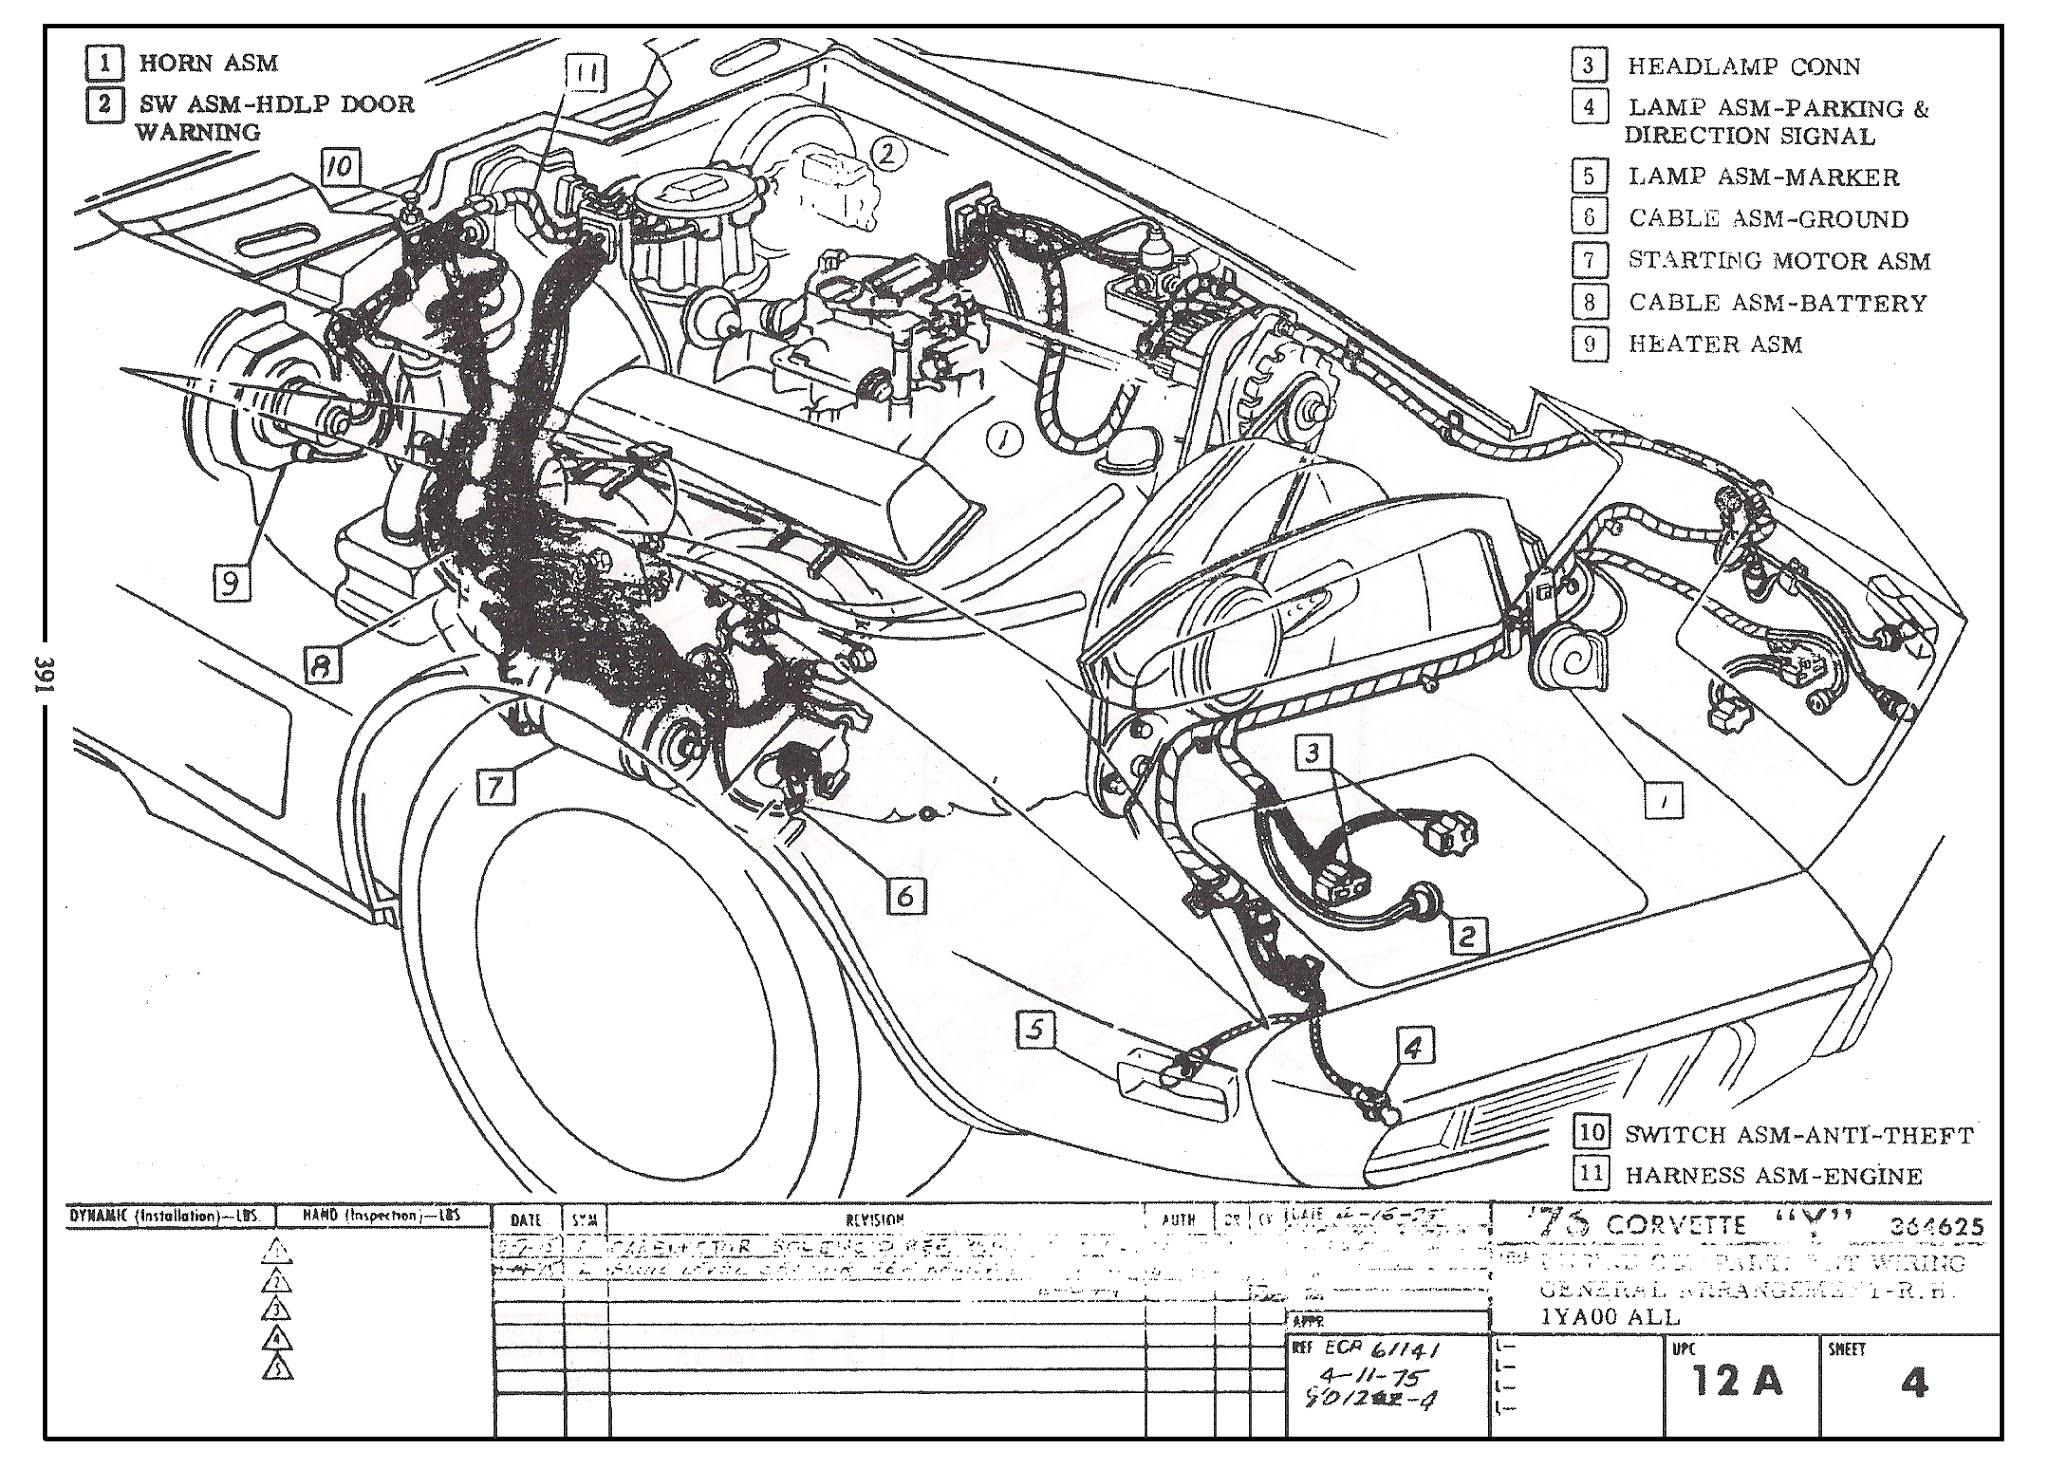 1976 corvette stingray: restore, repair, detail: how to replace c3 engine &  headlight wiring harness  1976 corvette stingray